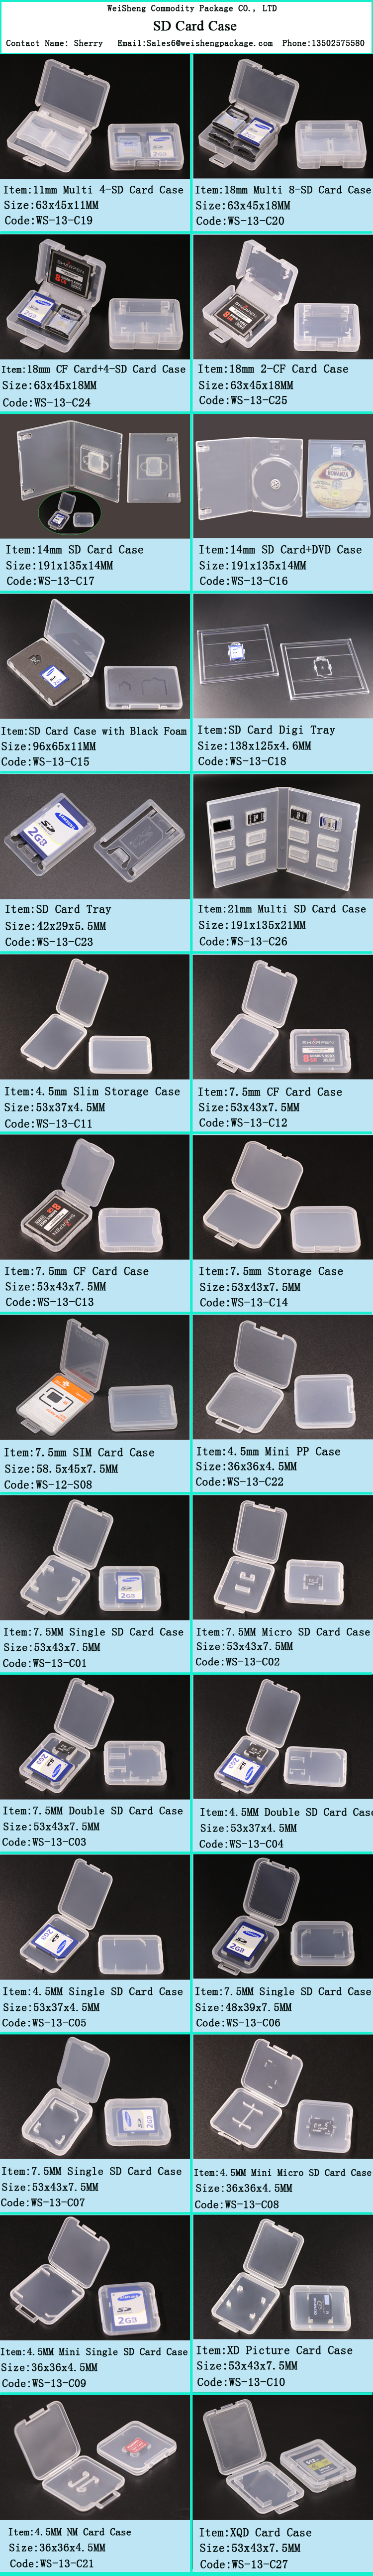 Gute Qualität PP-Material Einzel-SD-Karte Kunststoffkoffer